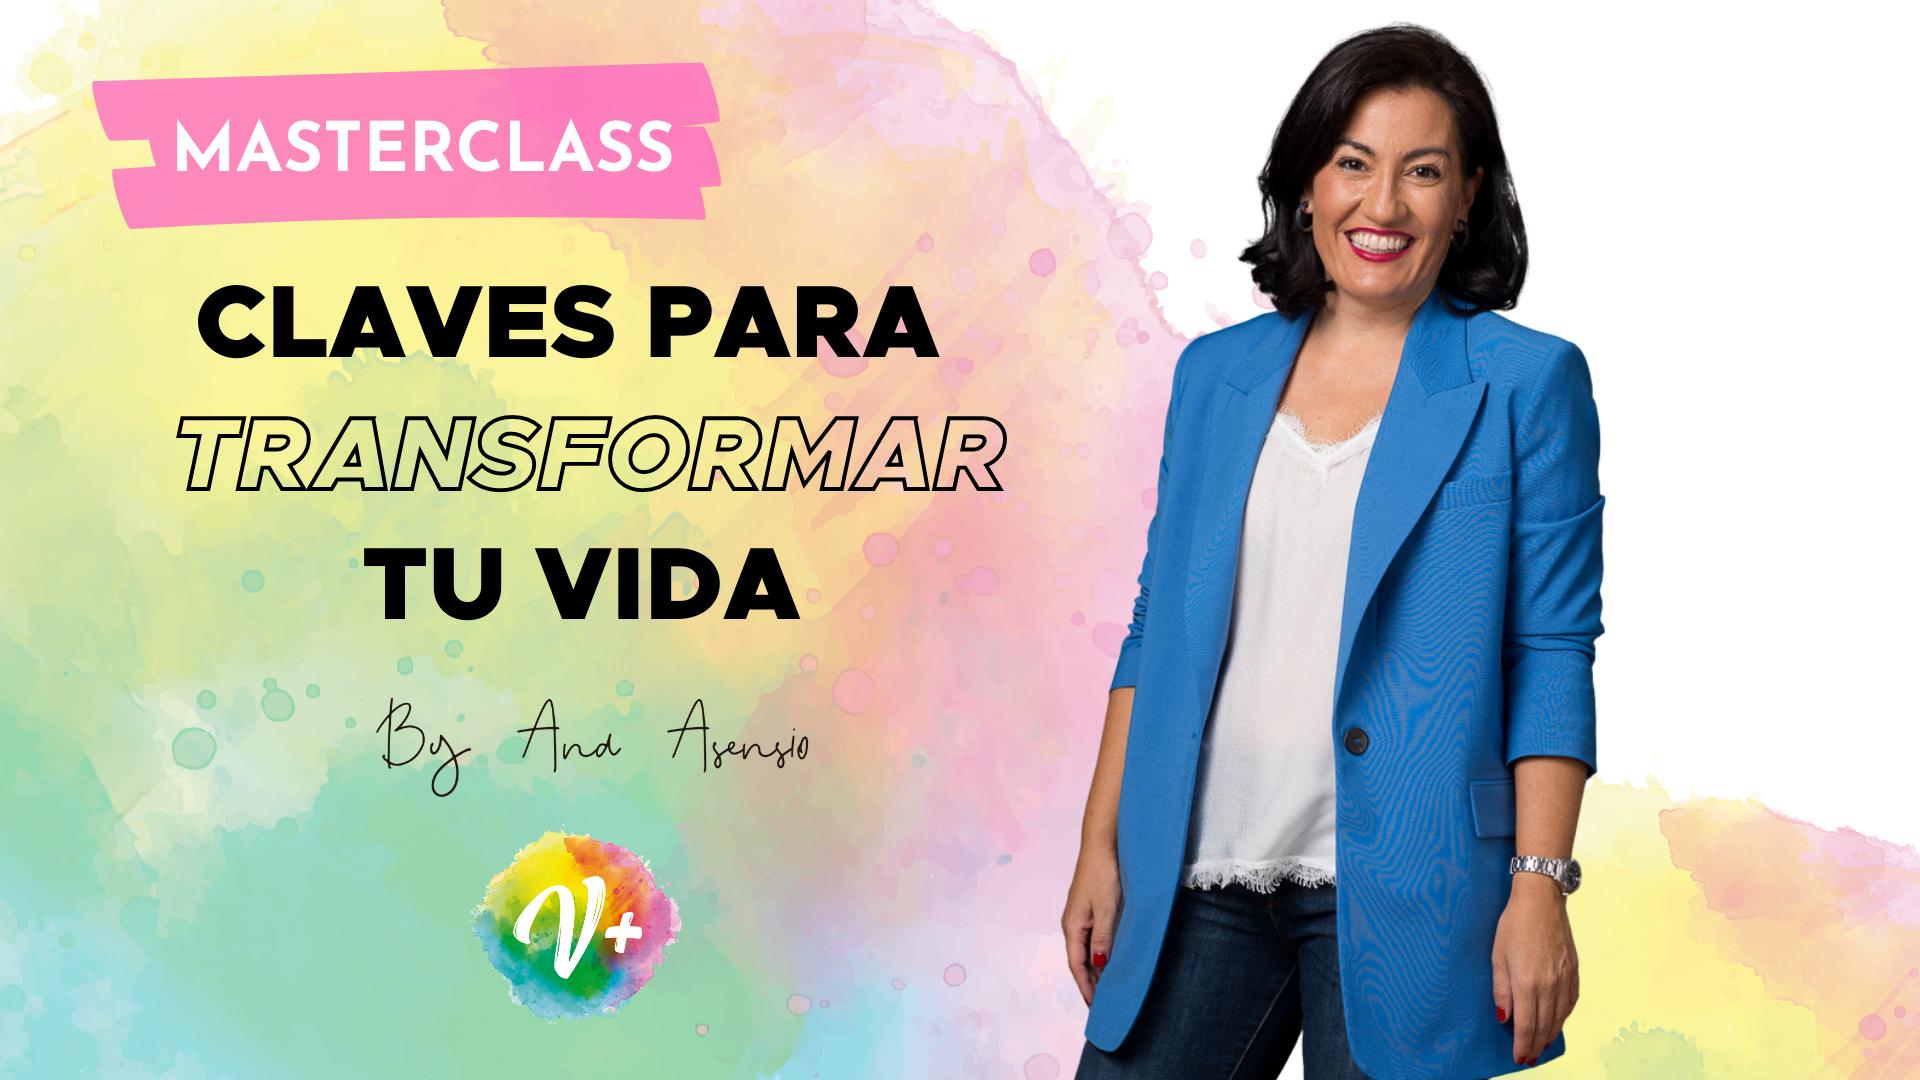 Masterclass: Claves para transformar tu vida